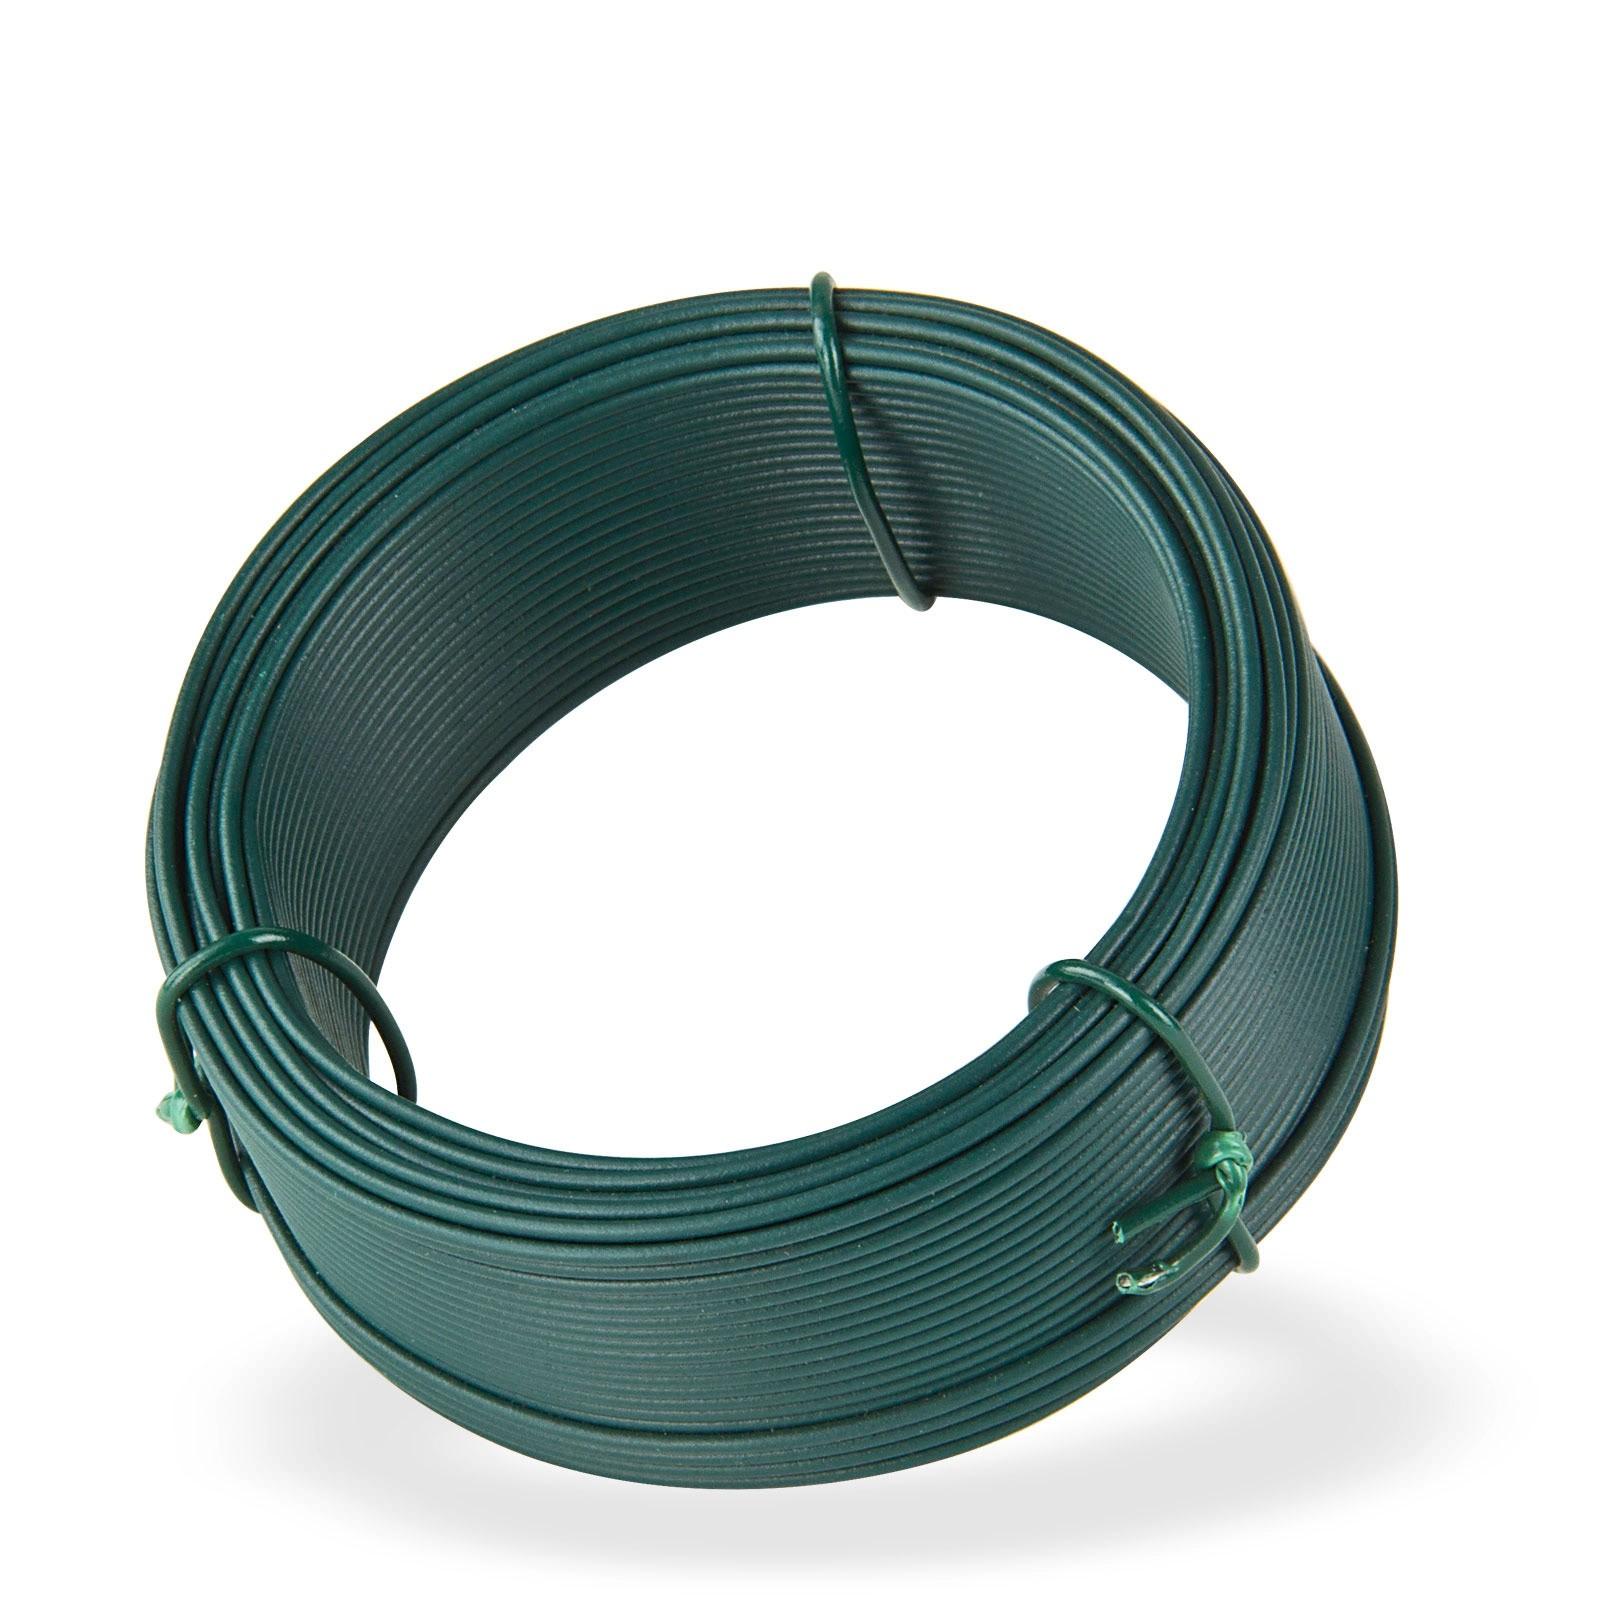 Dema Bindedraht grün 25 m x 1,4 mm Wickeldraht Basteldraht Blumendraht 31302